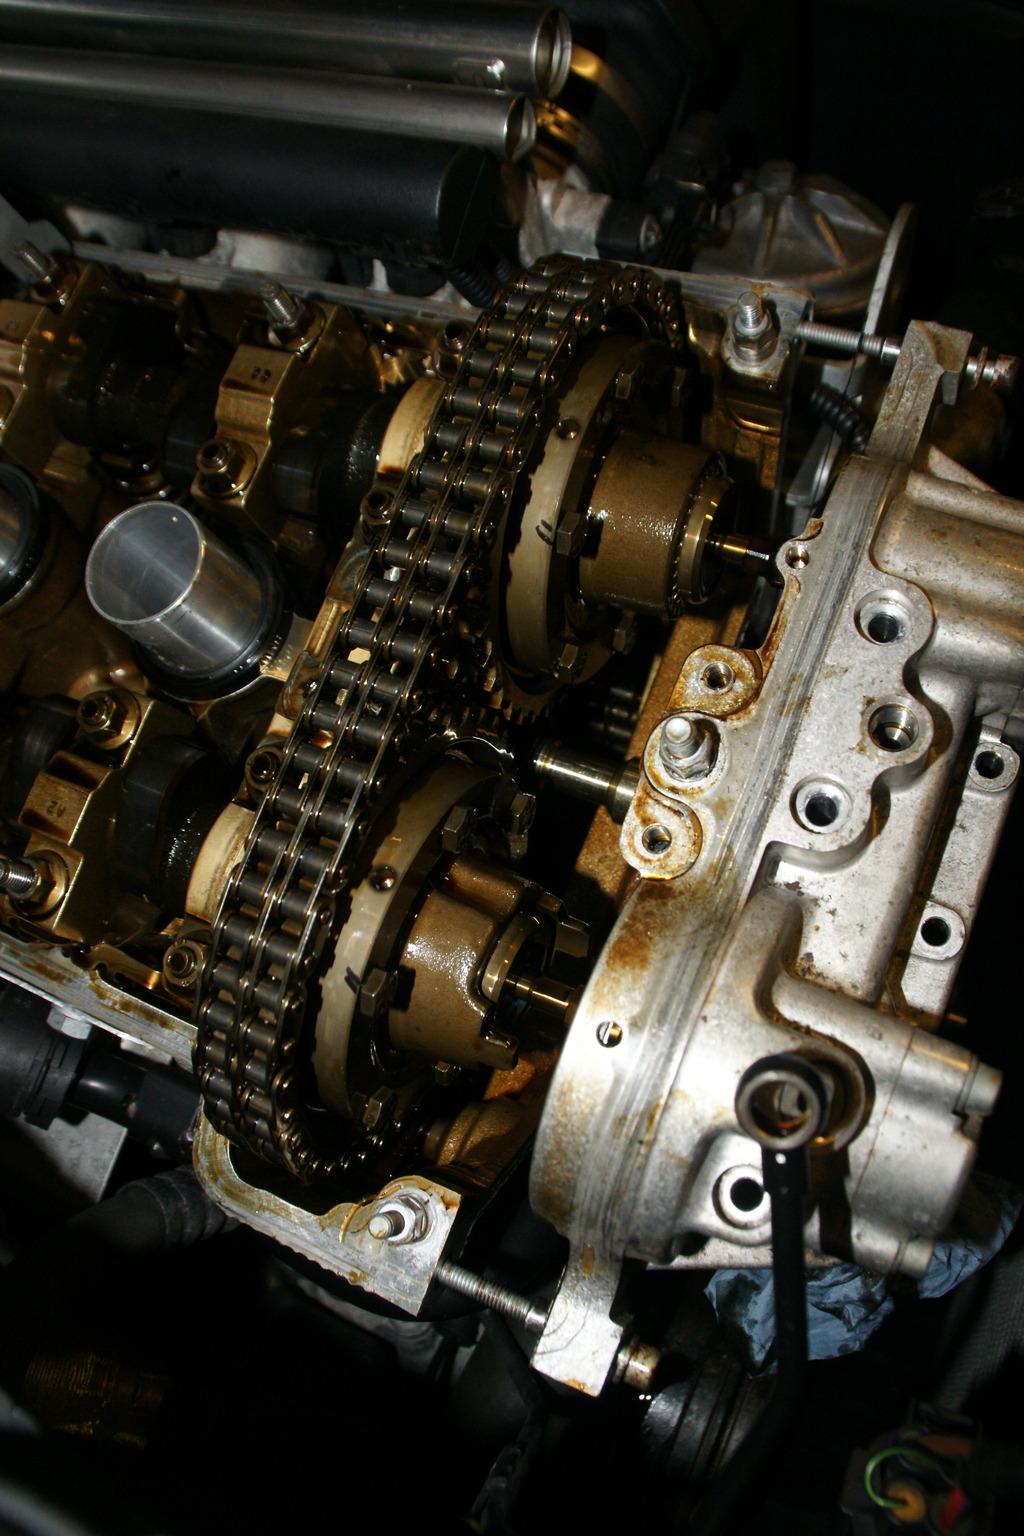 StevieM3's E46 M3 Vanos Rebuild - Hack EngineeringHack Engineering